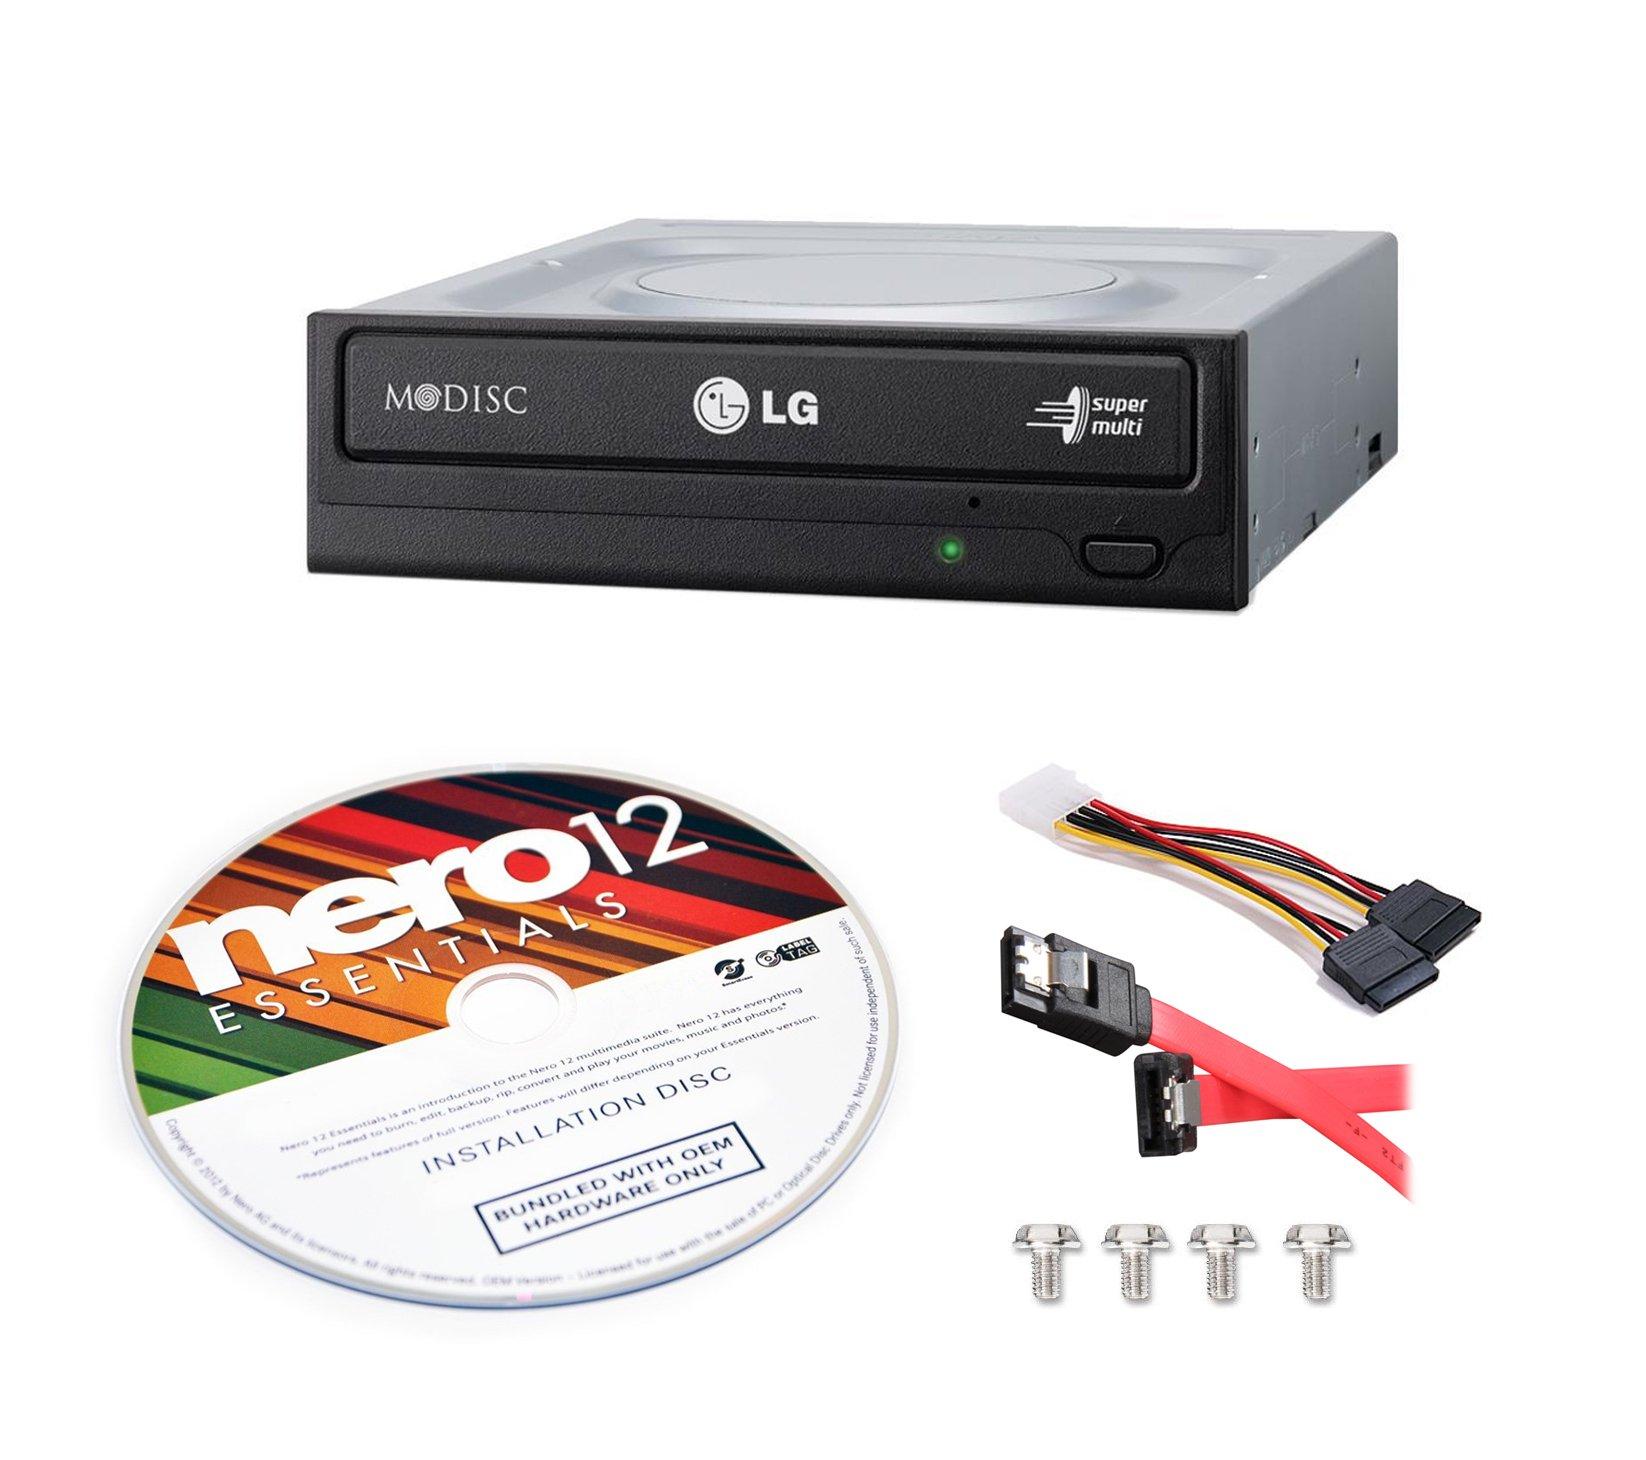 Bestduplicator LG 24x SATA masterizzatore DVD interno Drive W/m-disc Support GH24NS95B (nero) Bulk